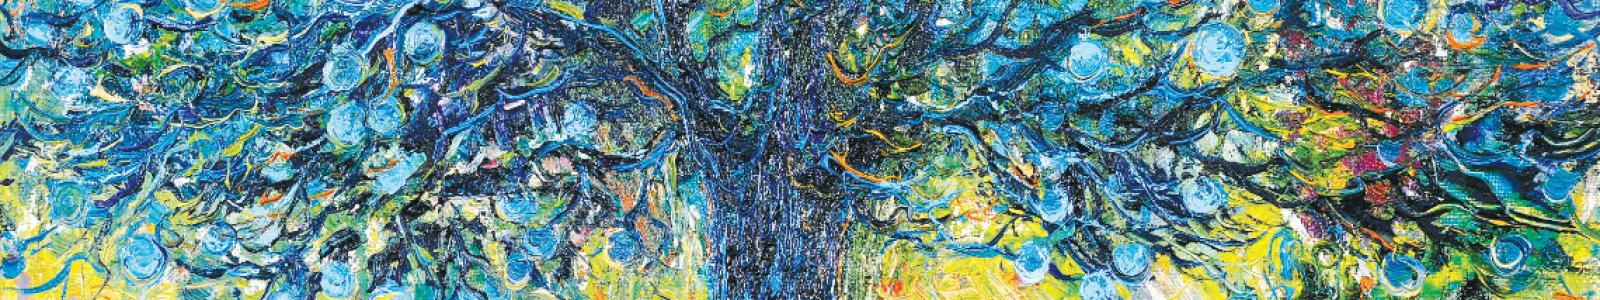 Gallery Painter Galina Morozova